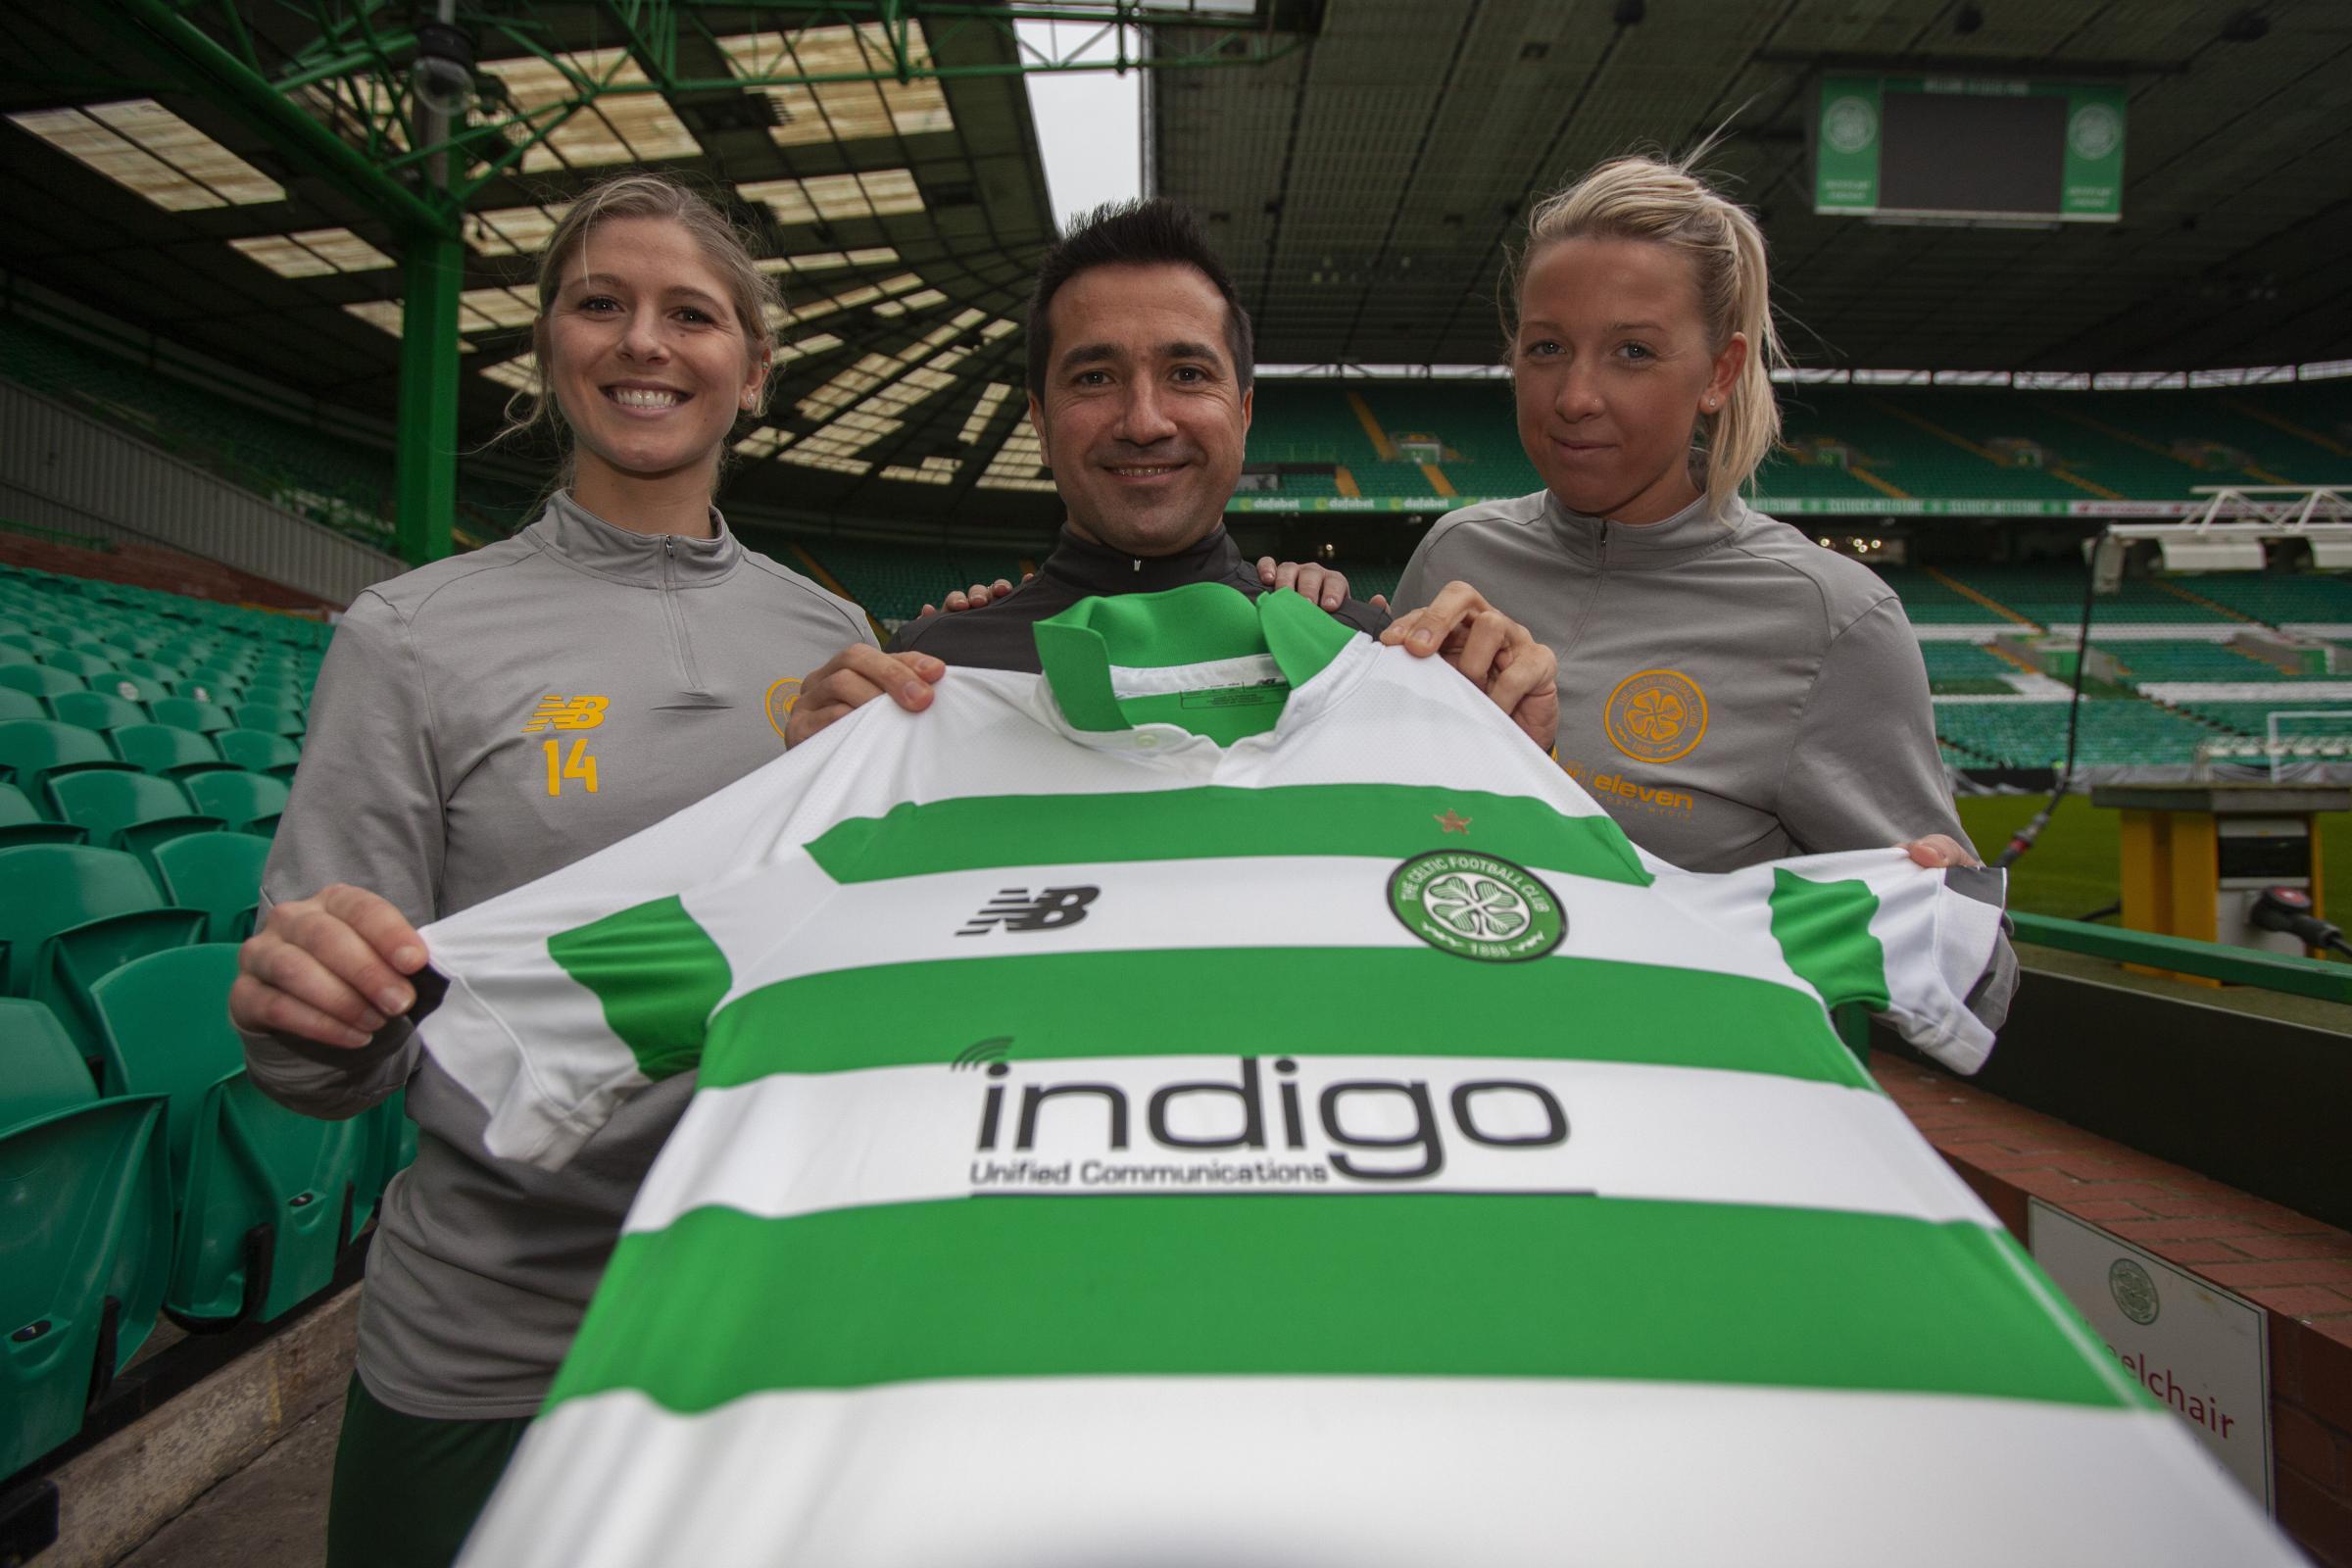 Ex-postwoman Chloe Craig delighted Celtic have delivered pro dream